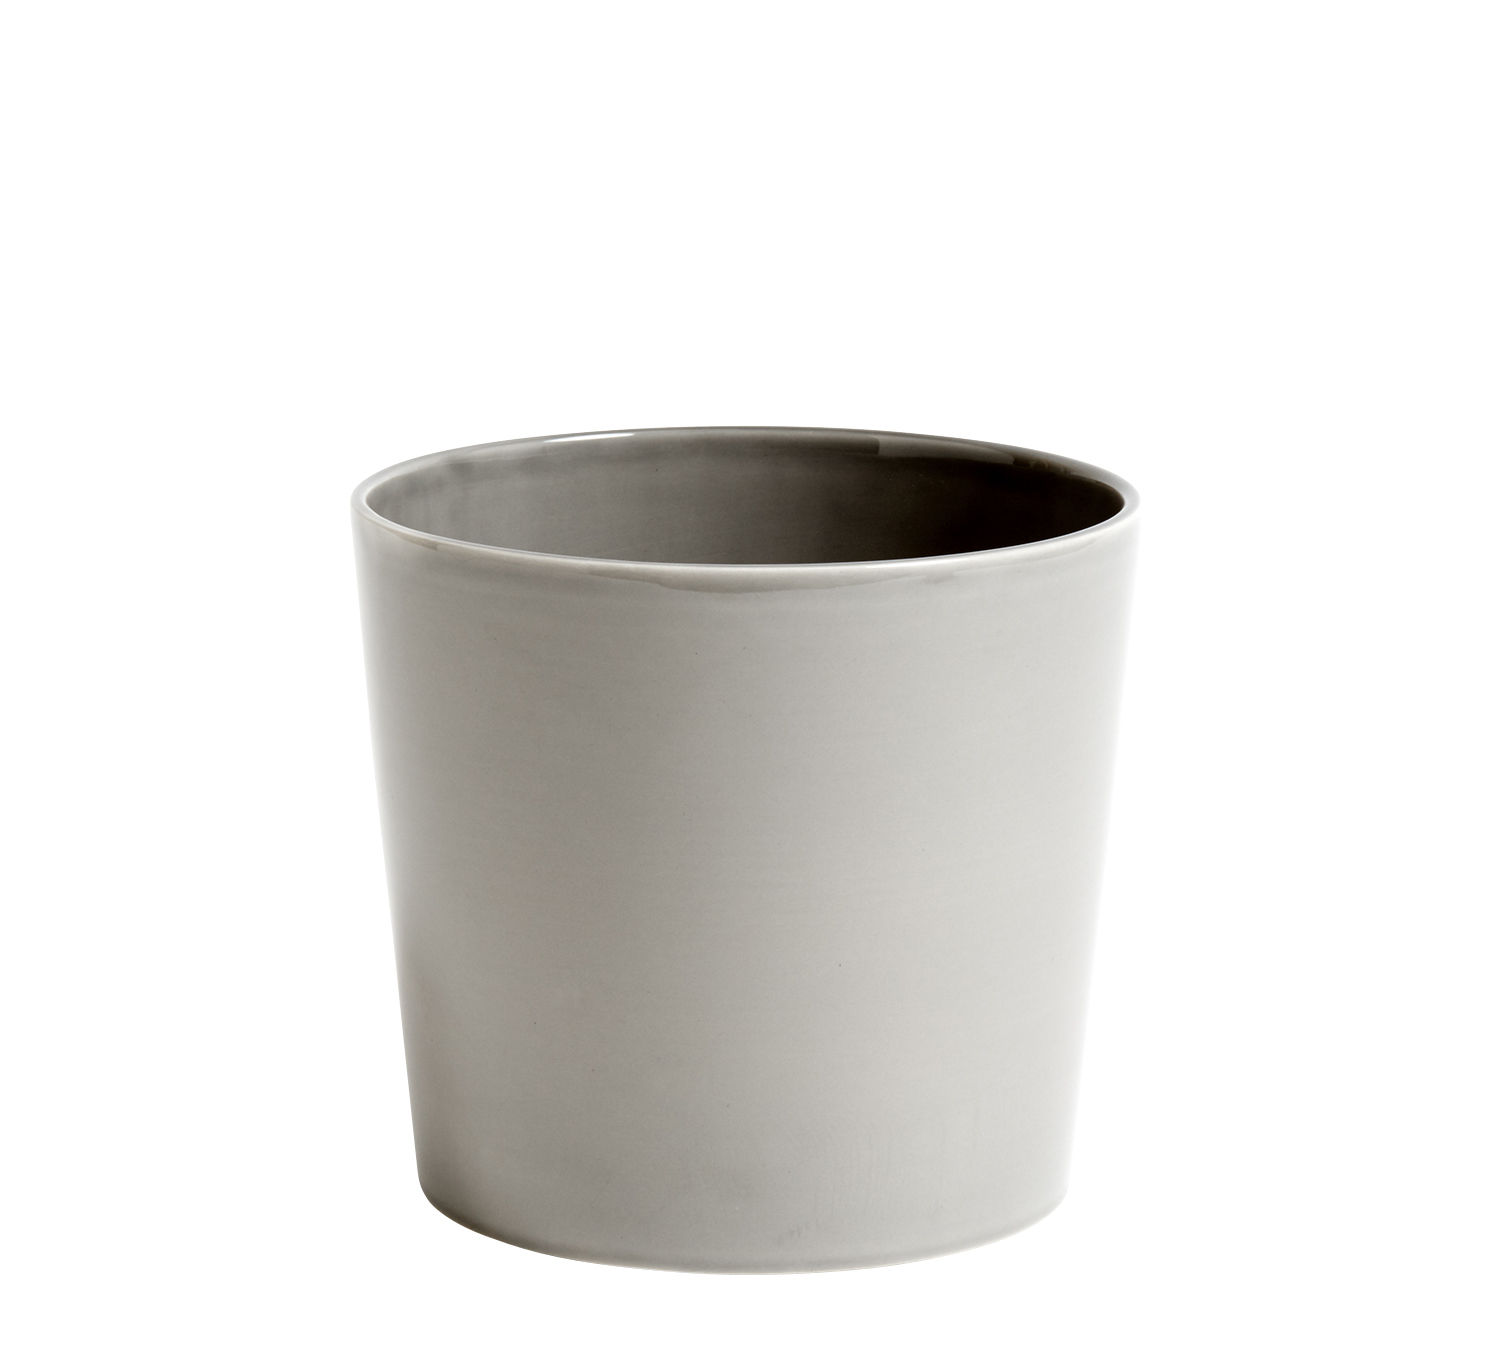 Decoration - Flower Pots & House Plants - Botanical Large Flowerpot - /Ø18 cm - Ceramic by Hay - Pot / Grey - Ceramic